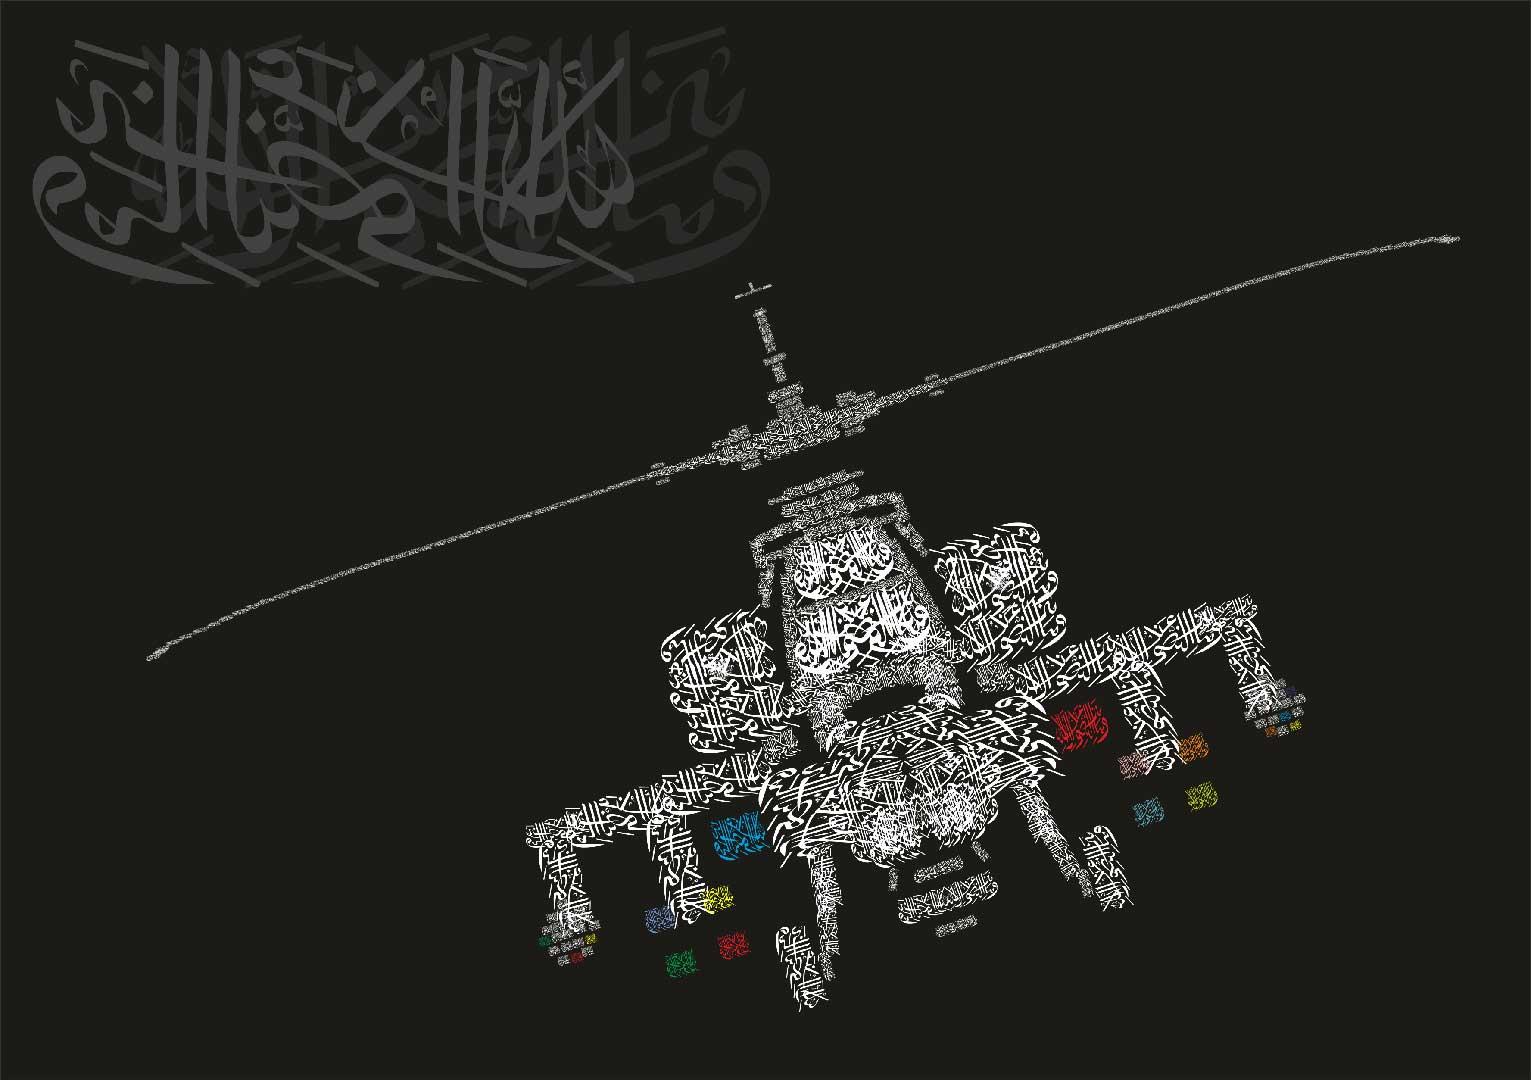 War Paradox (c) Razwan Ul-Haq